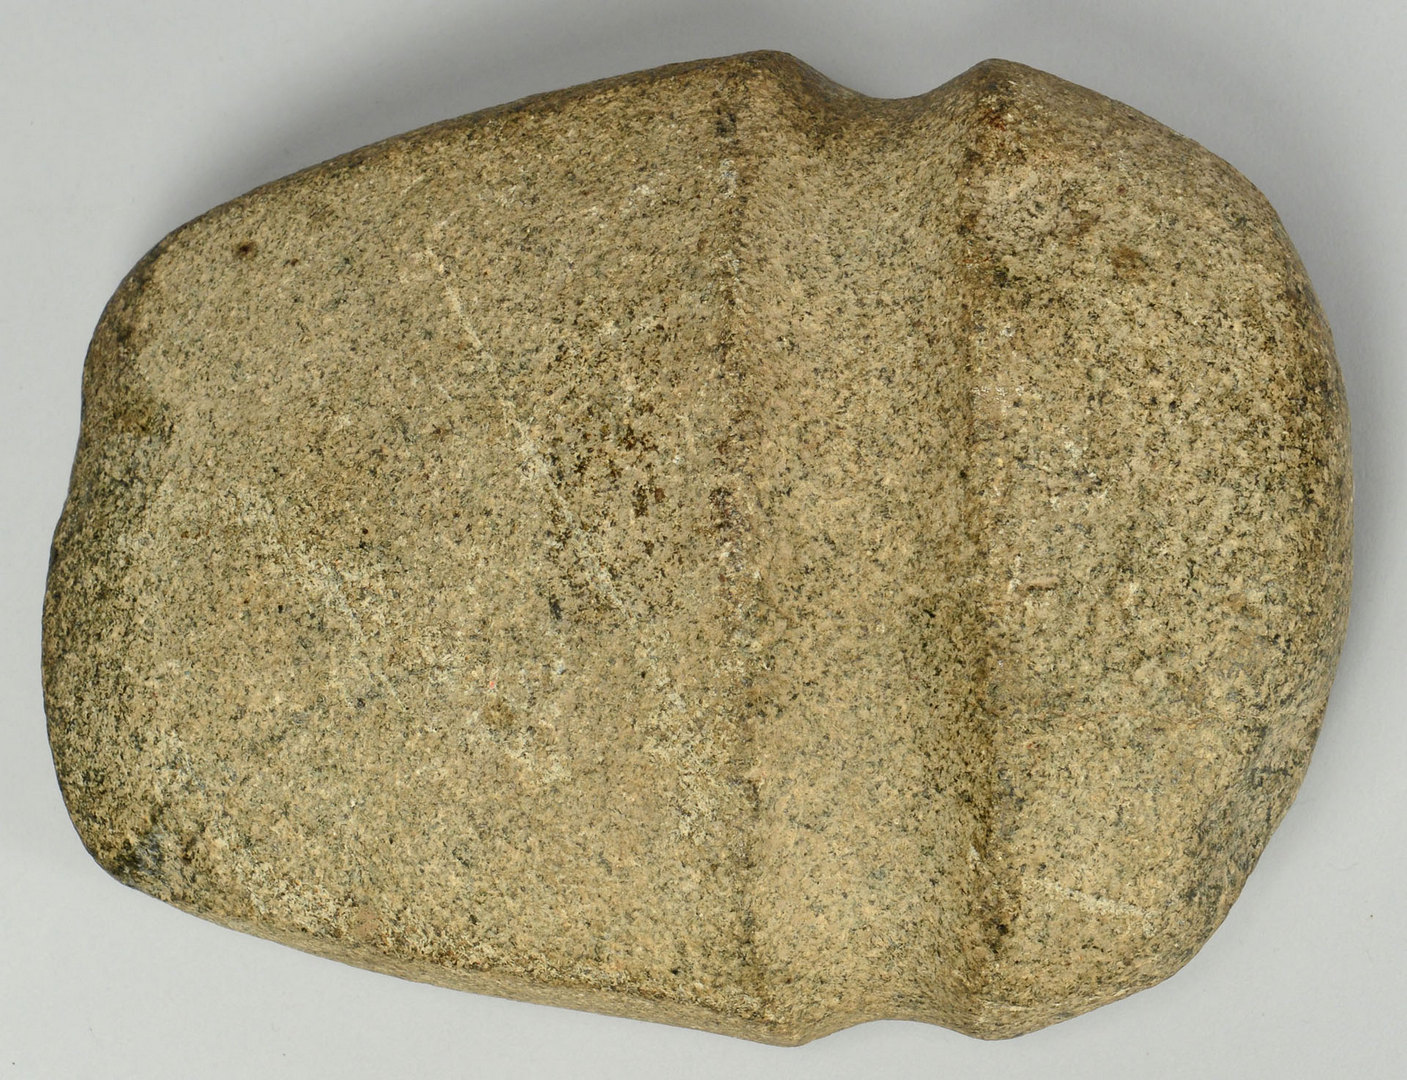 Lot 404: Three Quarter 3/4 Grooved Granite Axe